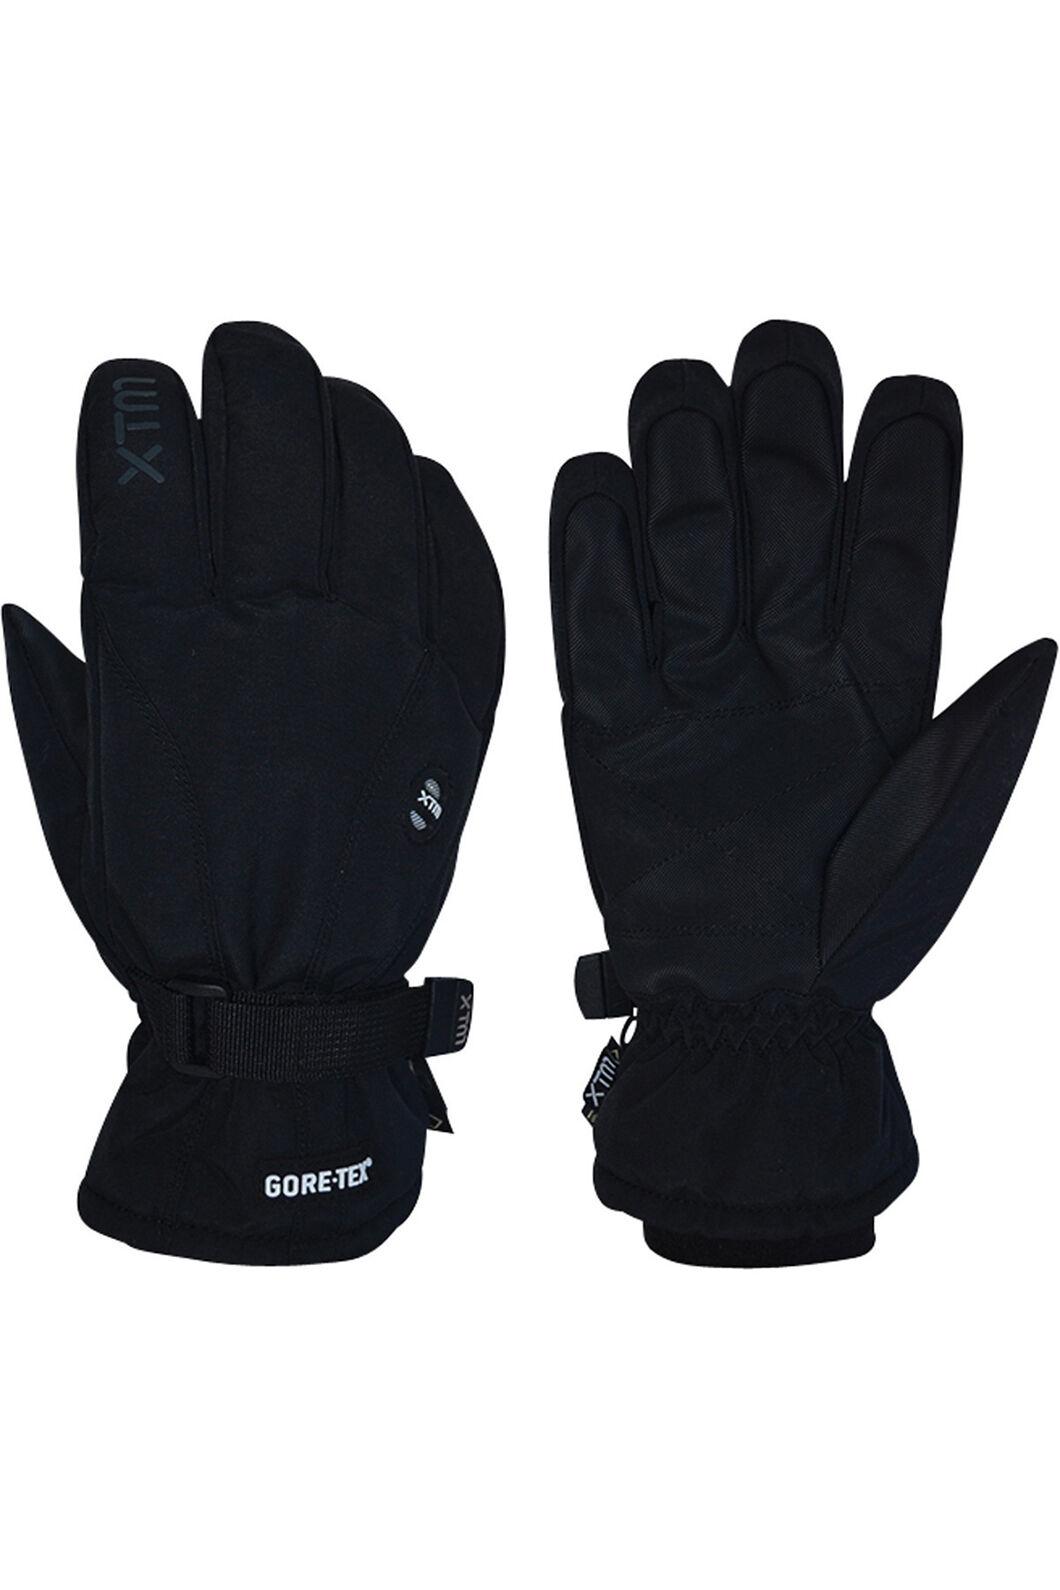 XTM Men's Whistler Glove, Black, hi-res